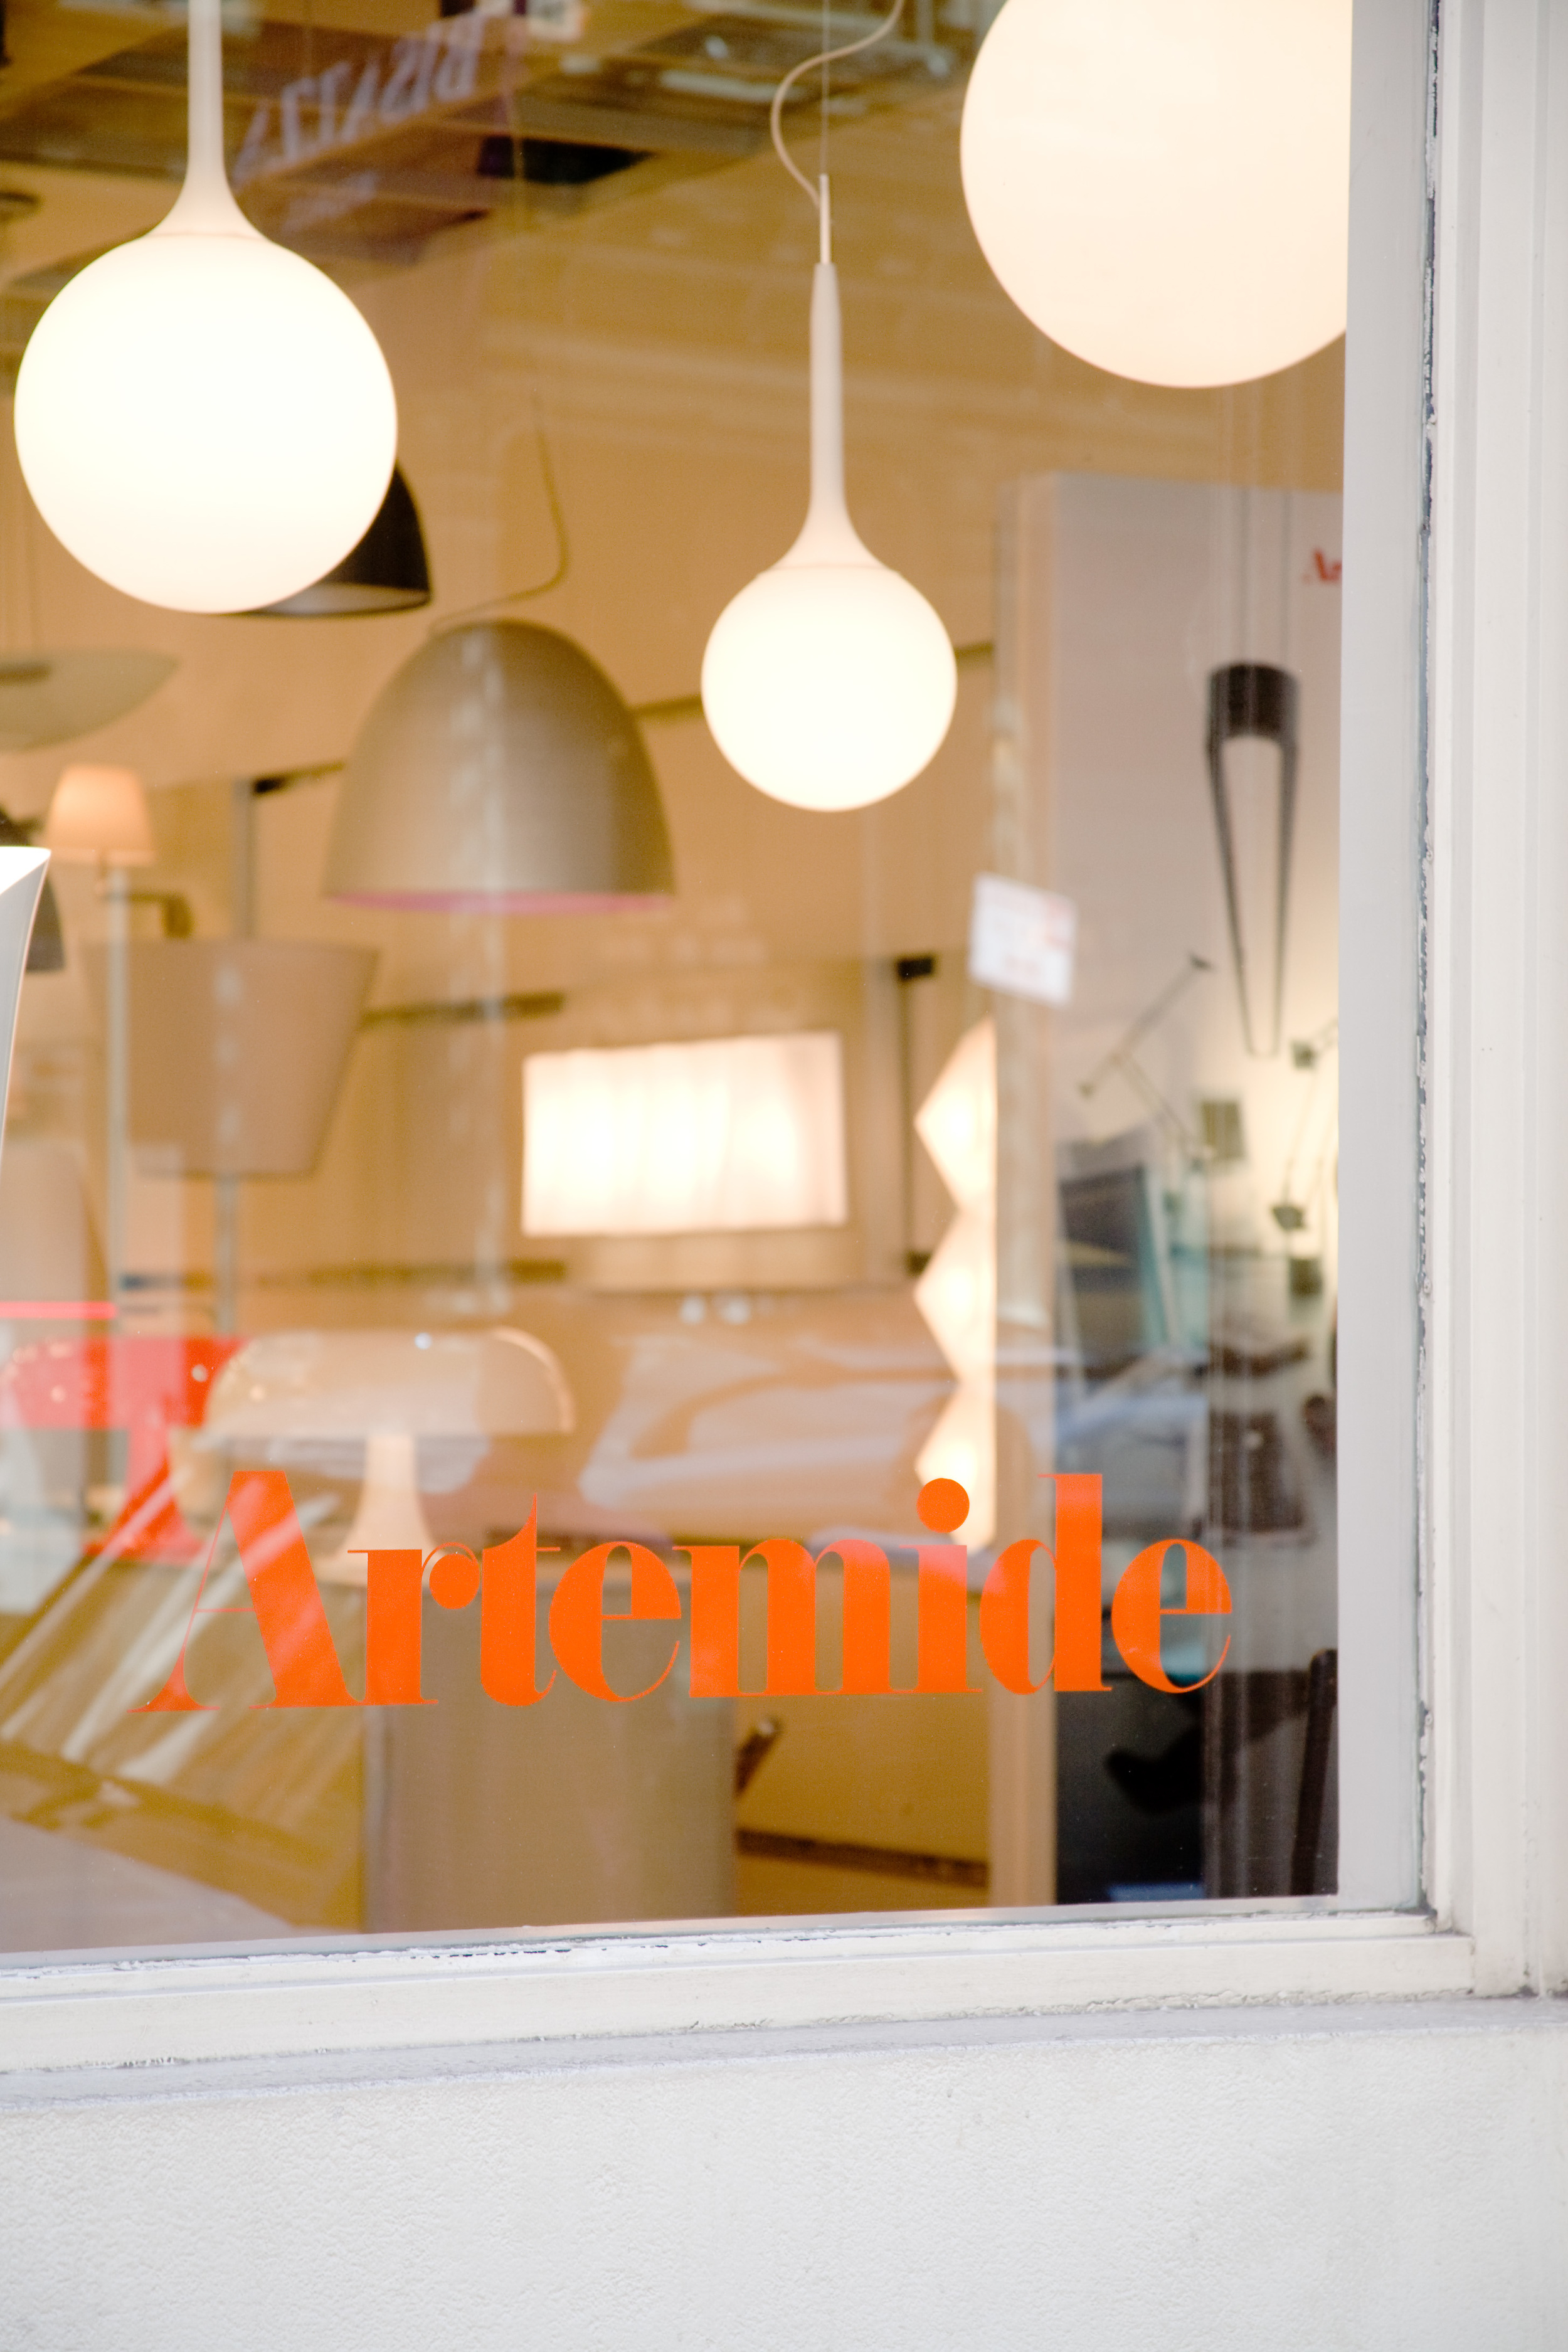 Atremide, Window Display